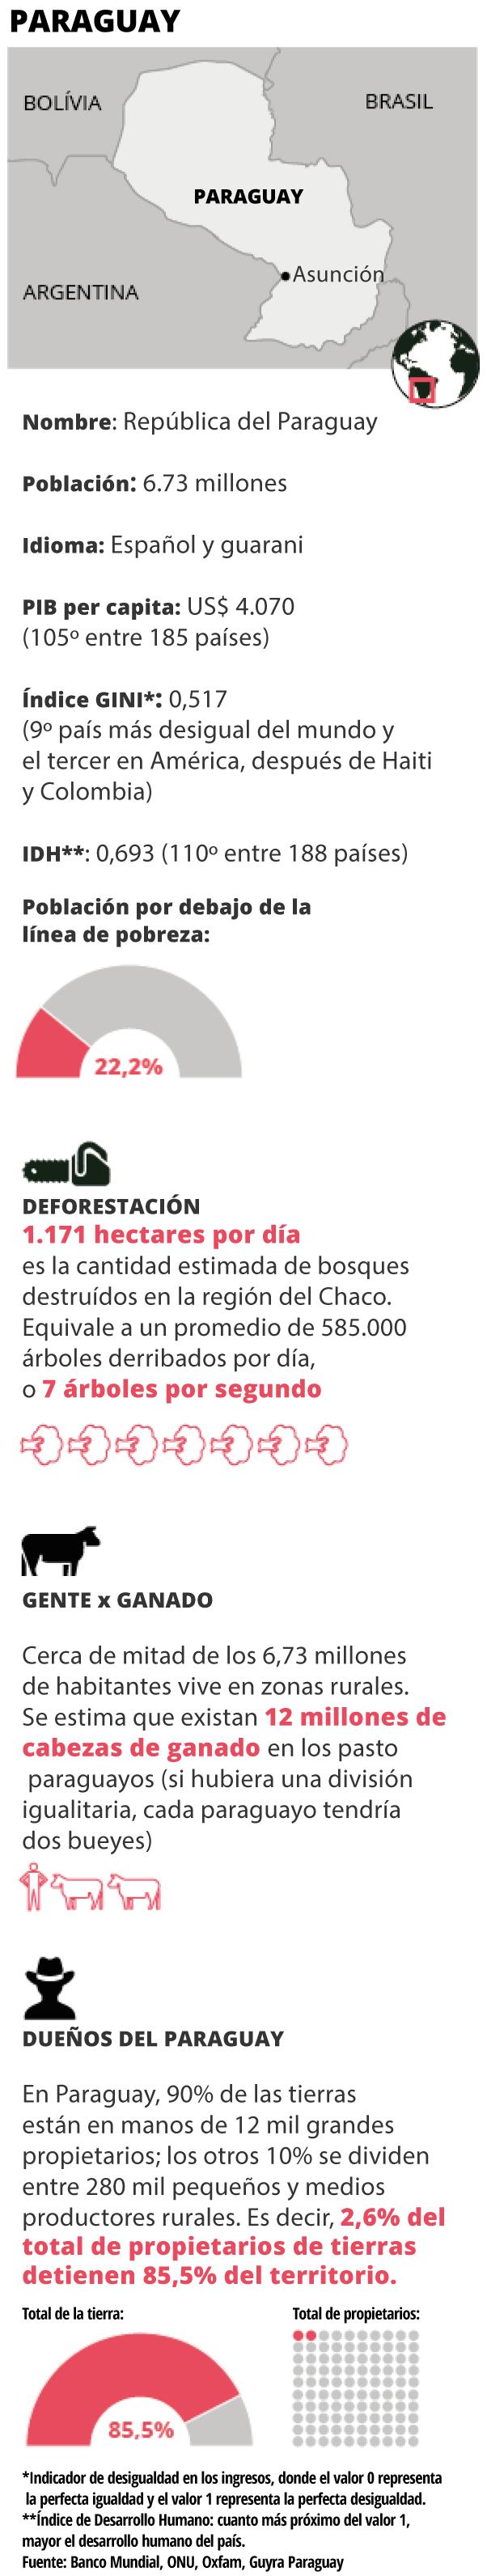 Datos generales del Paraguay